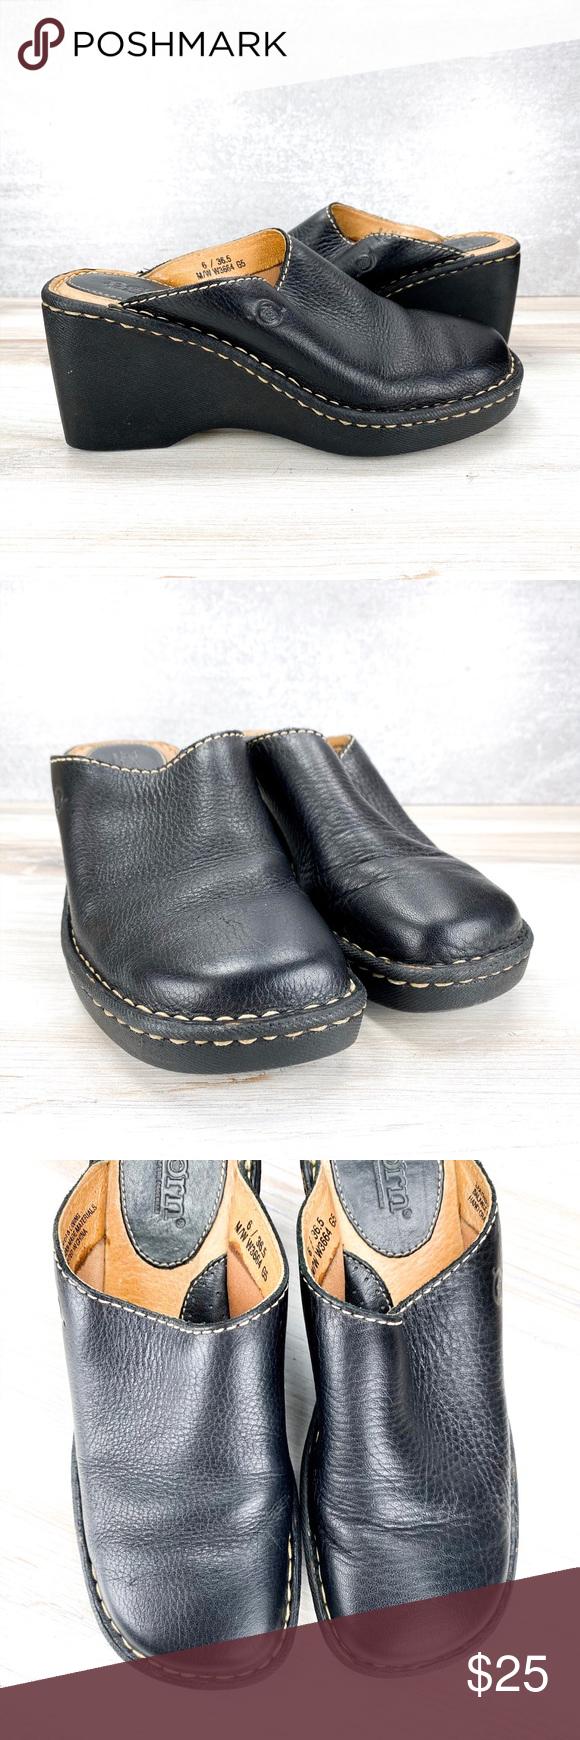 Born Black Leather Mules - 6/36.5